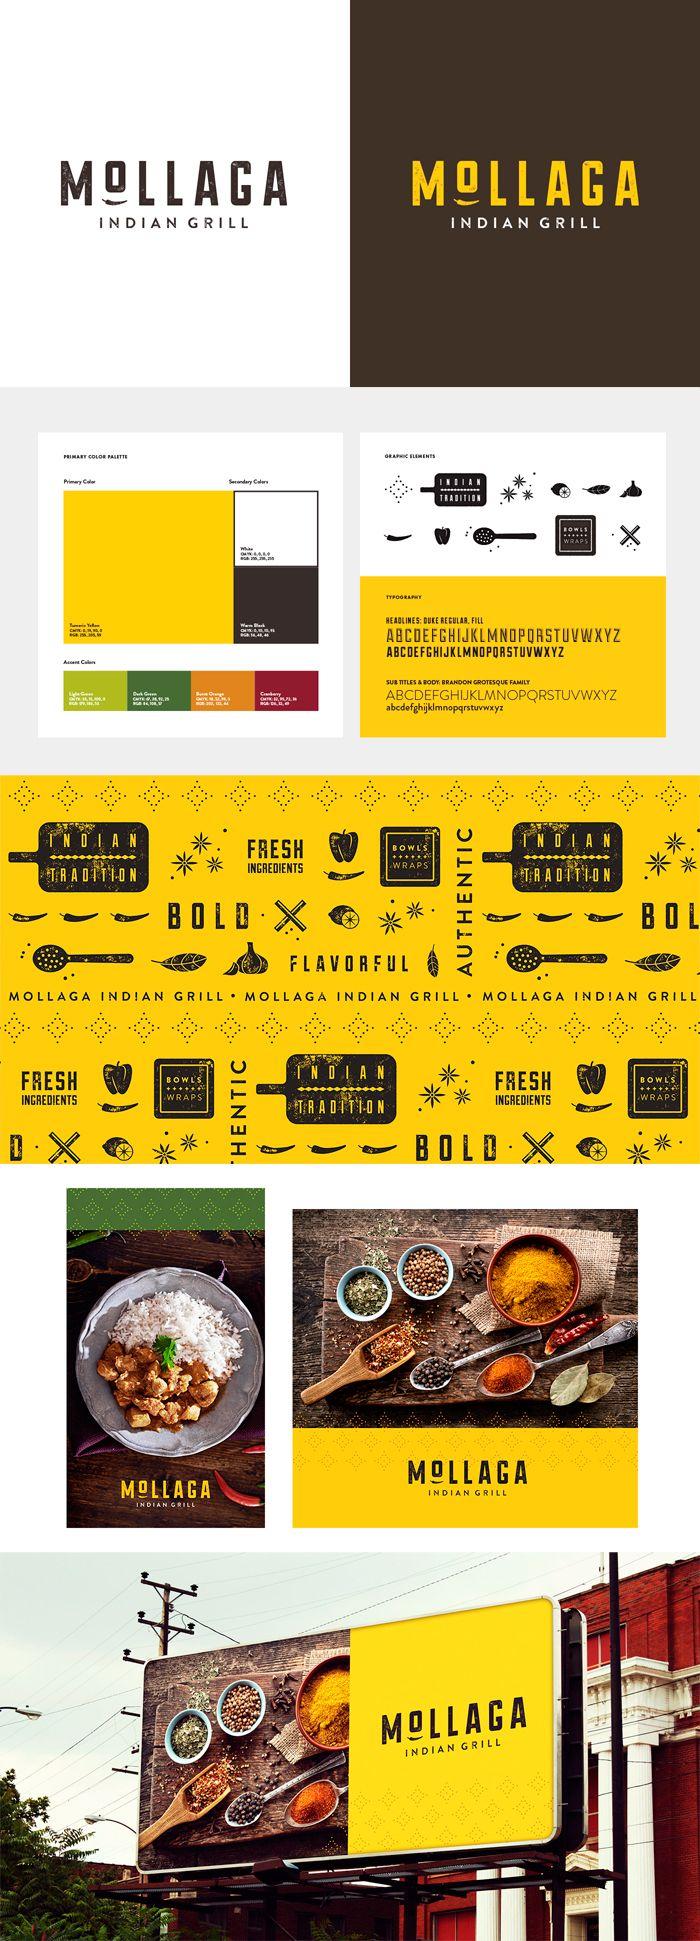 Restaurant designs restaurant logo creator restaurant logo maker - Identity Mollaga Food Restaurant Brand Identity Designbranding Designlogo